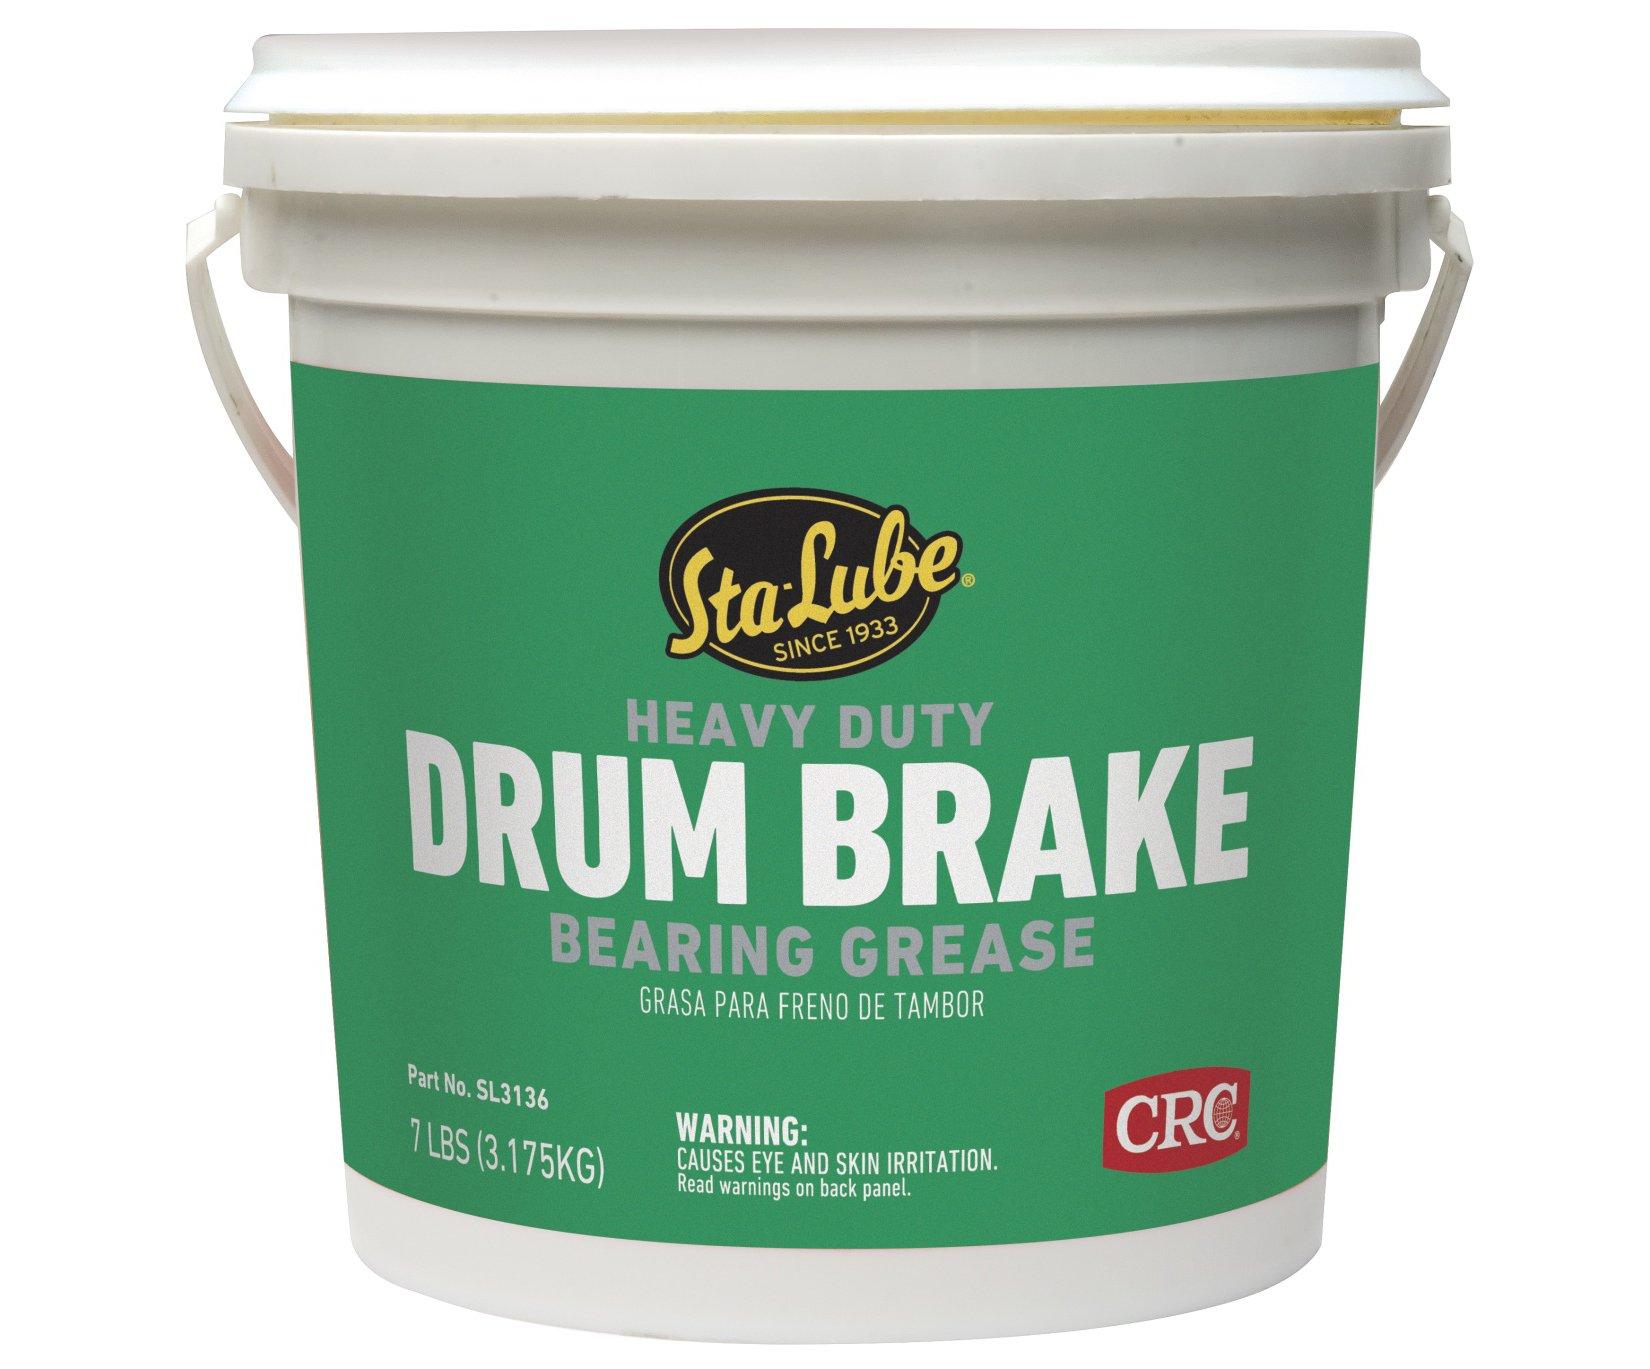 Sta-Lube SL3136 Heavy Duty Drum Brake Wheel Bearing Grease, 7 lbs. by Sta-Lube